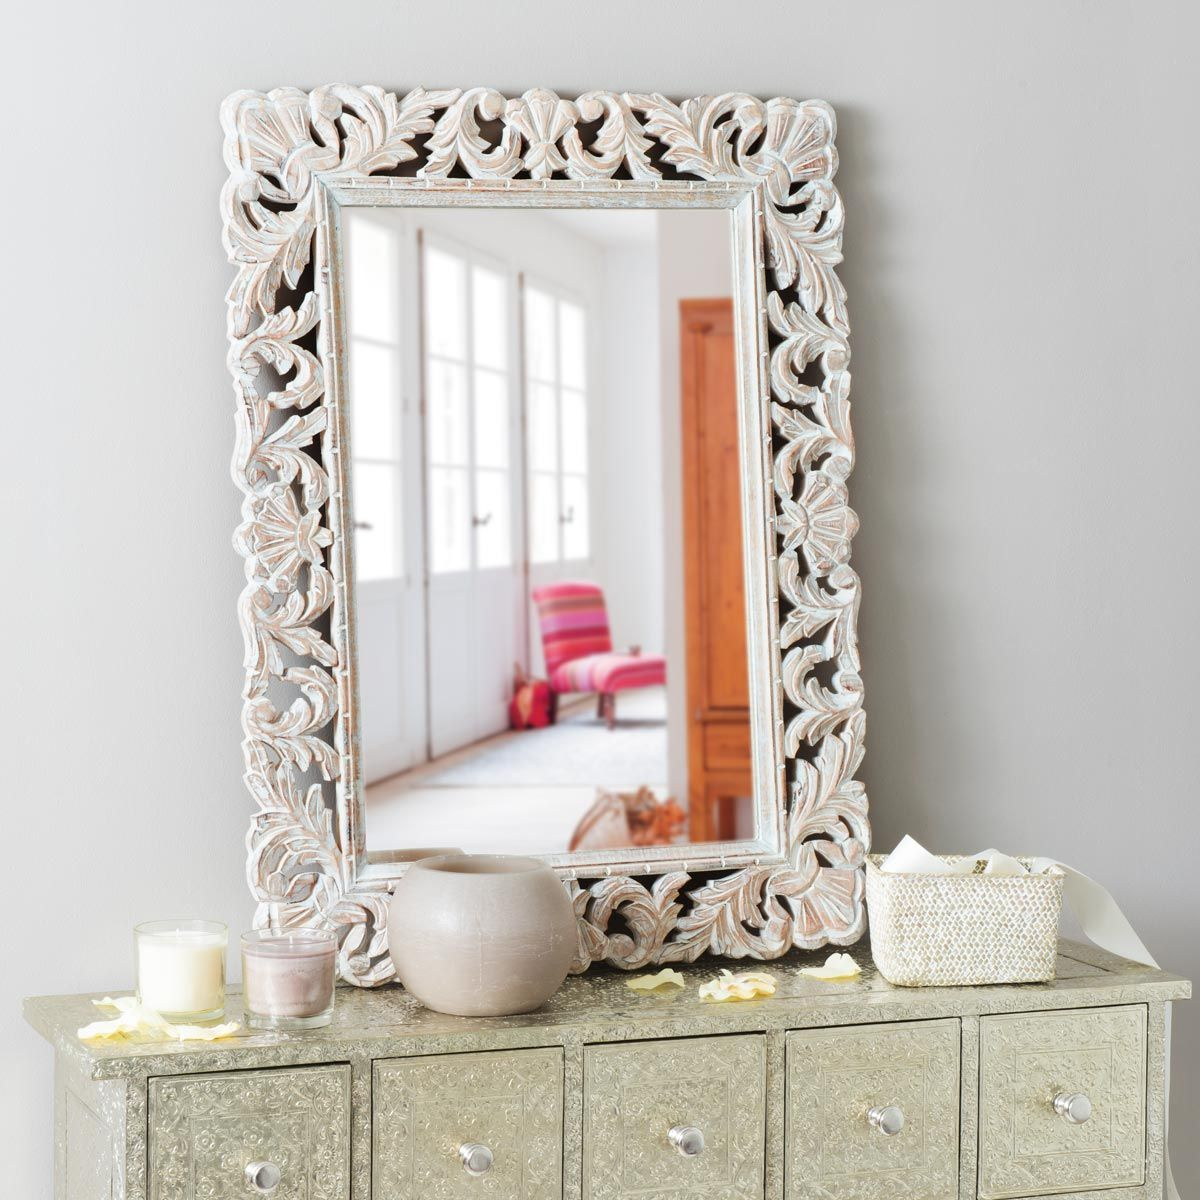 White Mirror Maisons du Monde 50 x 70 cm